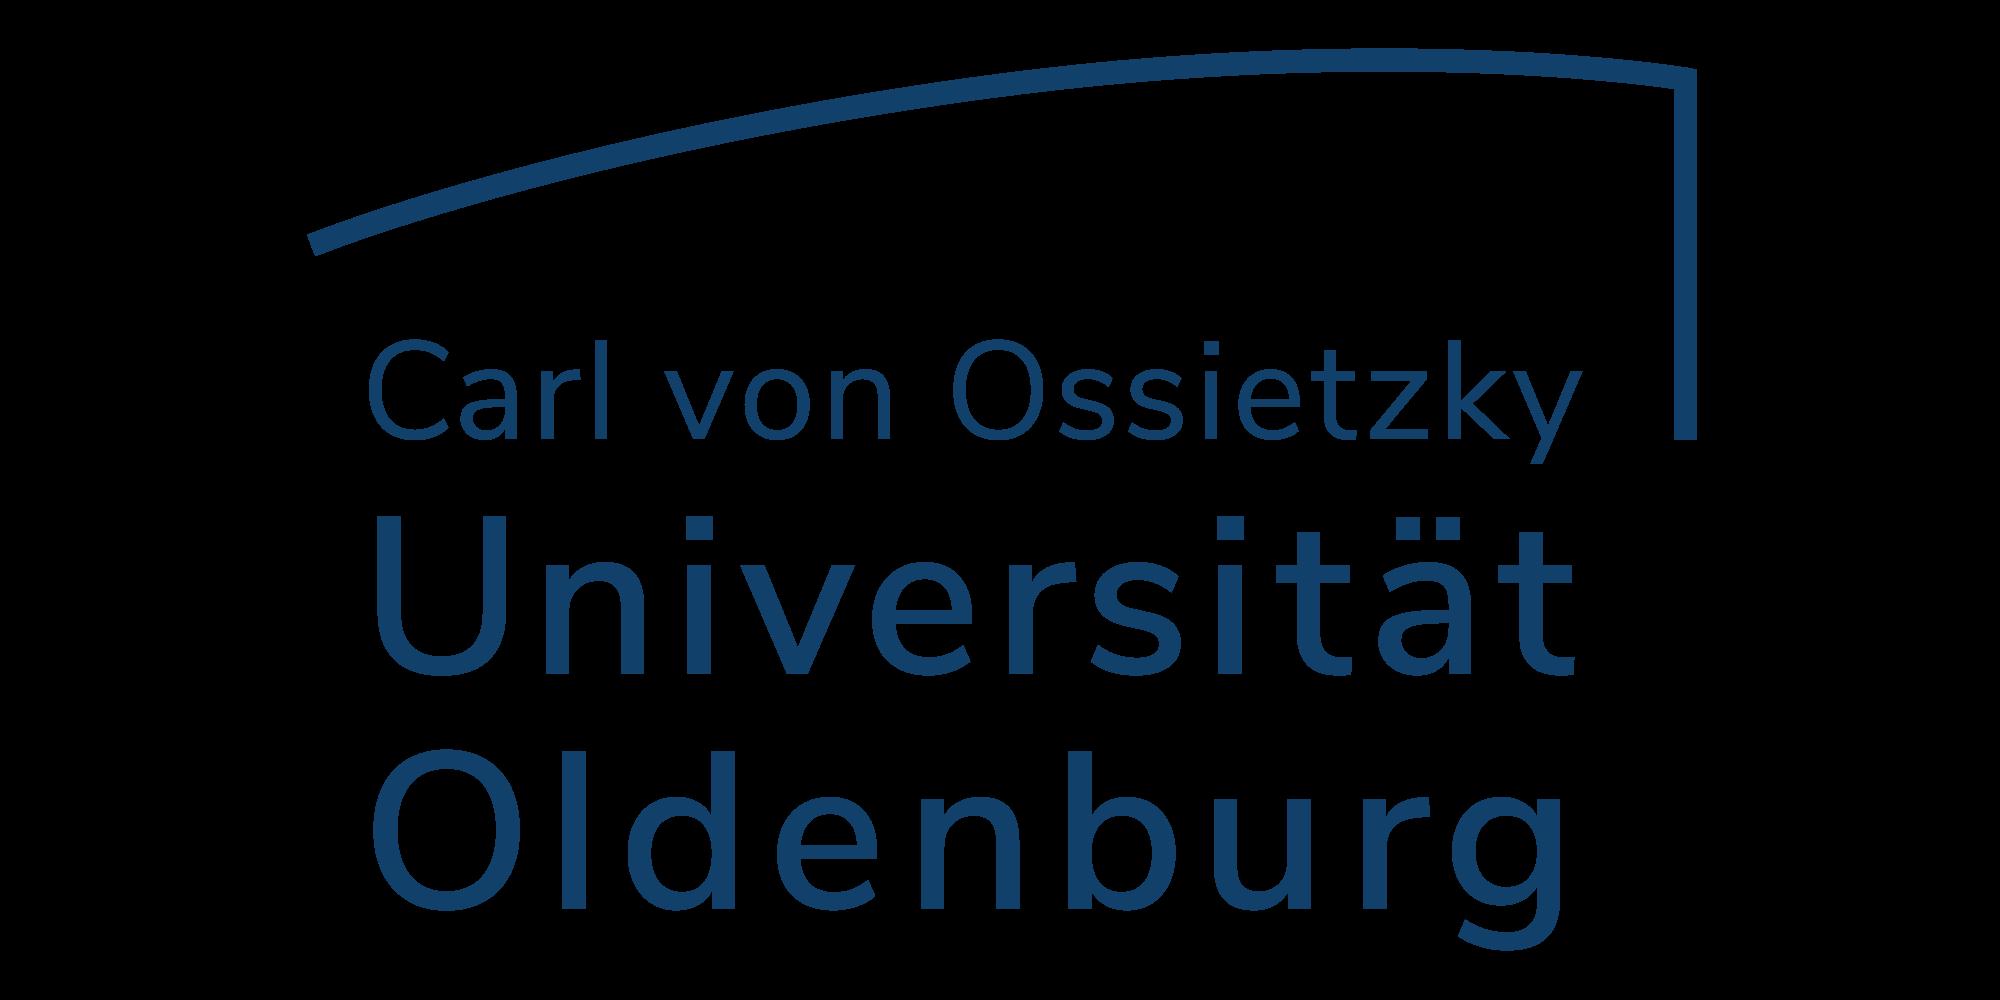 Logo Carl von Ossietzky University of Oldenburg